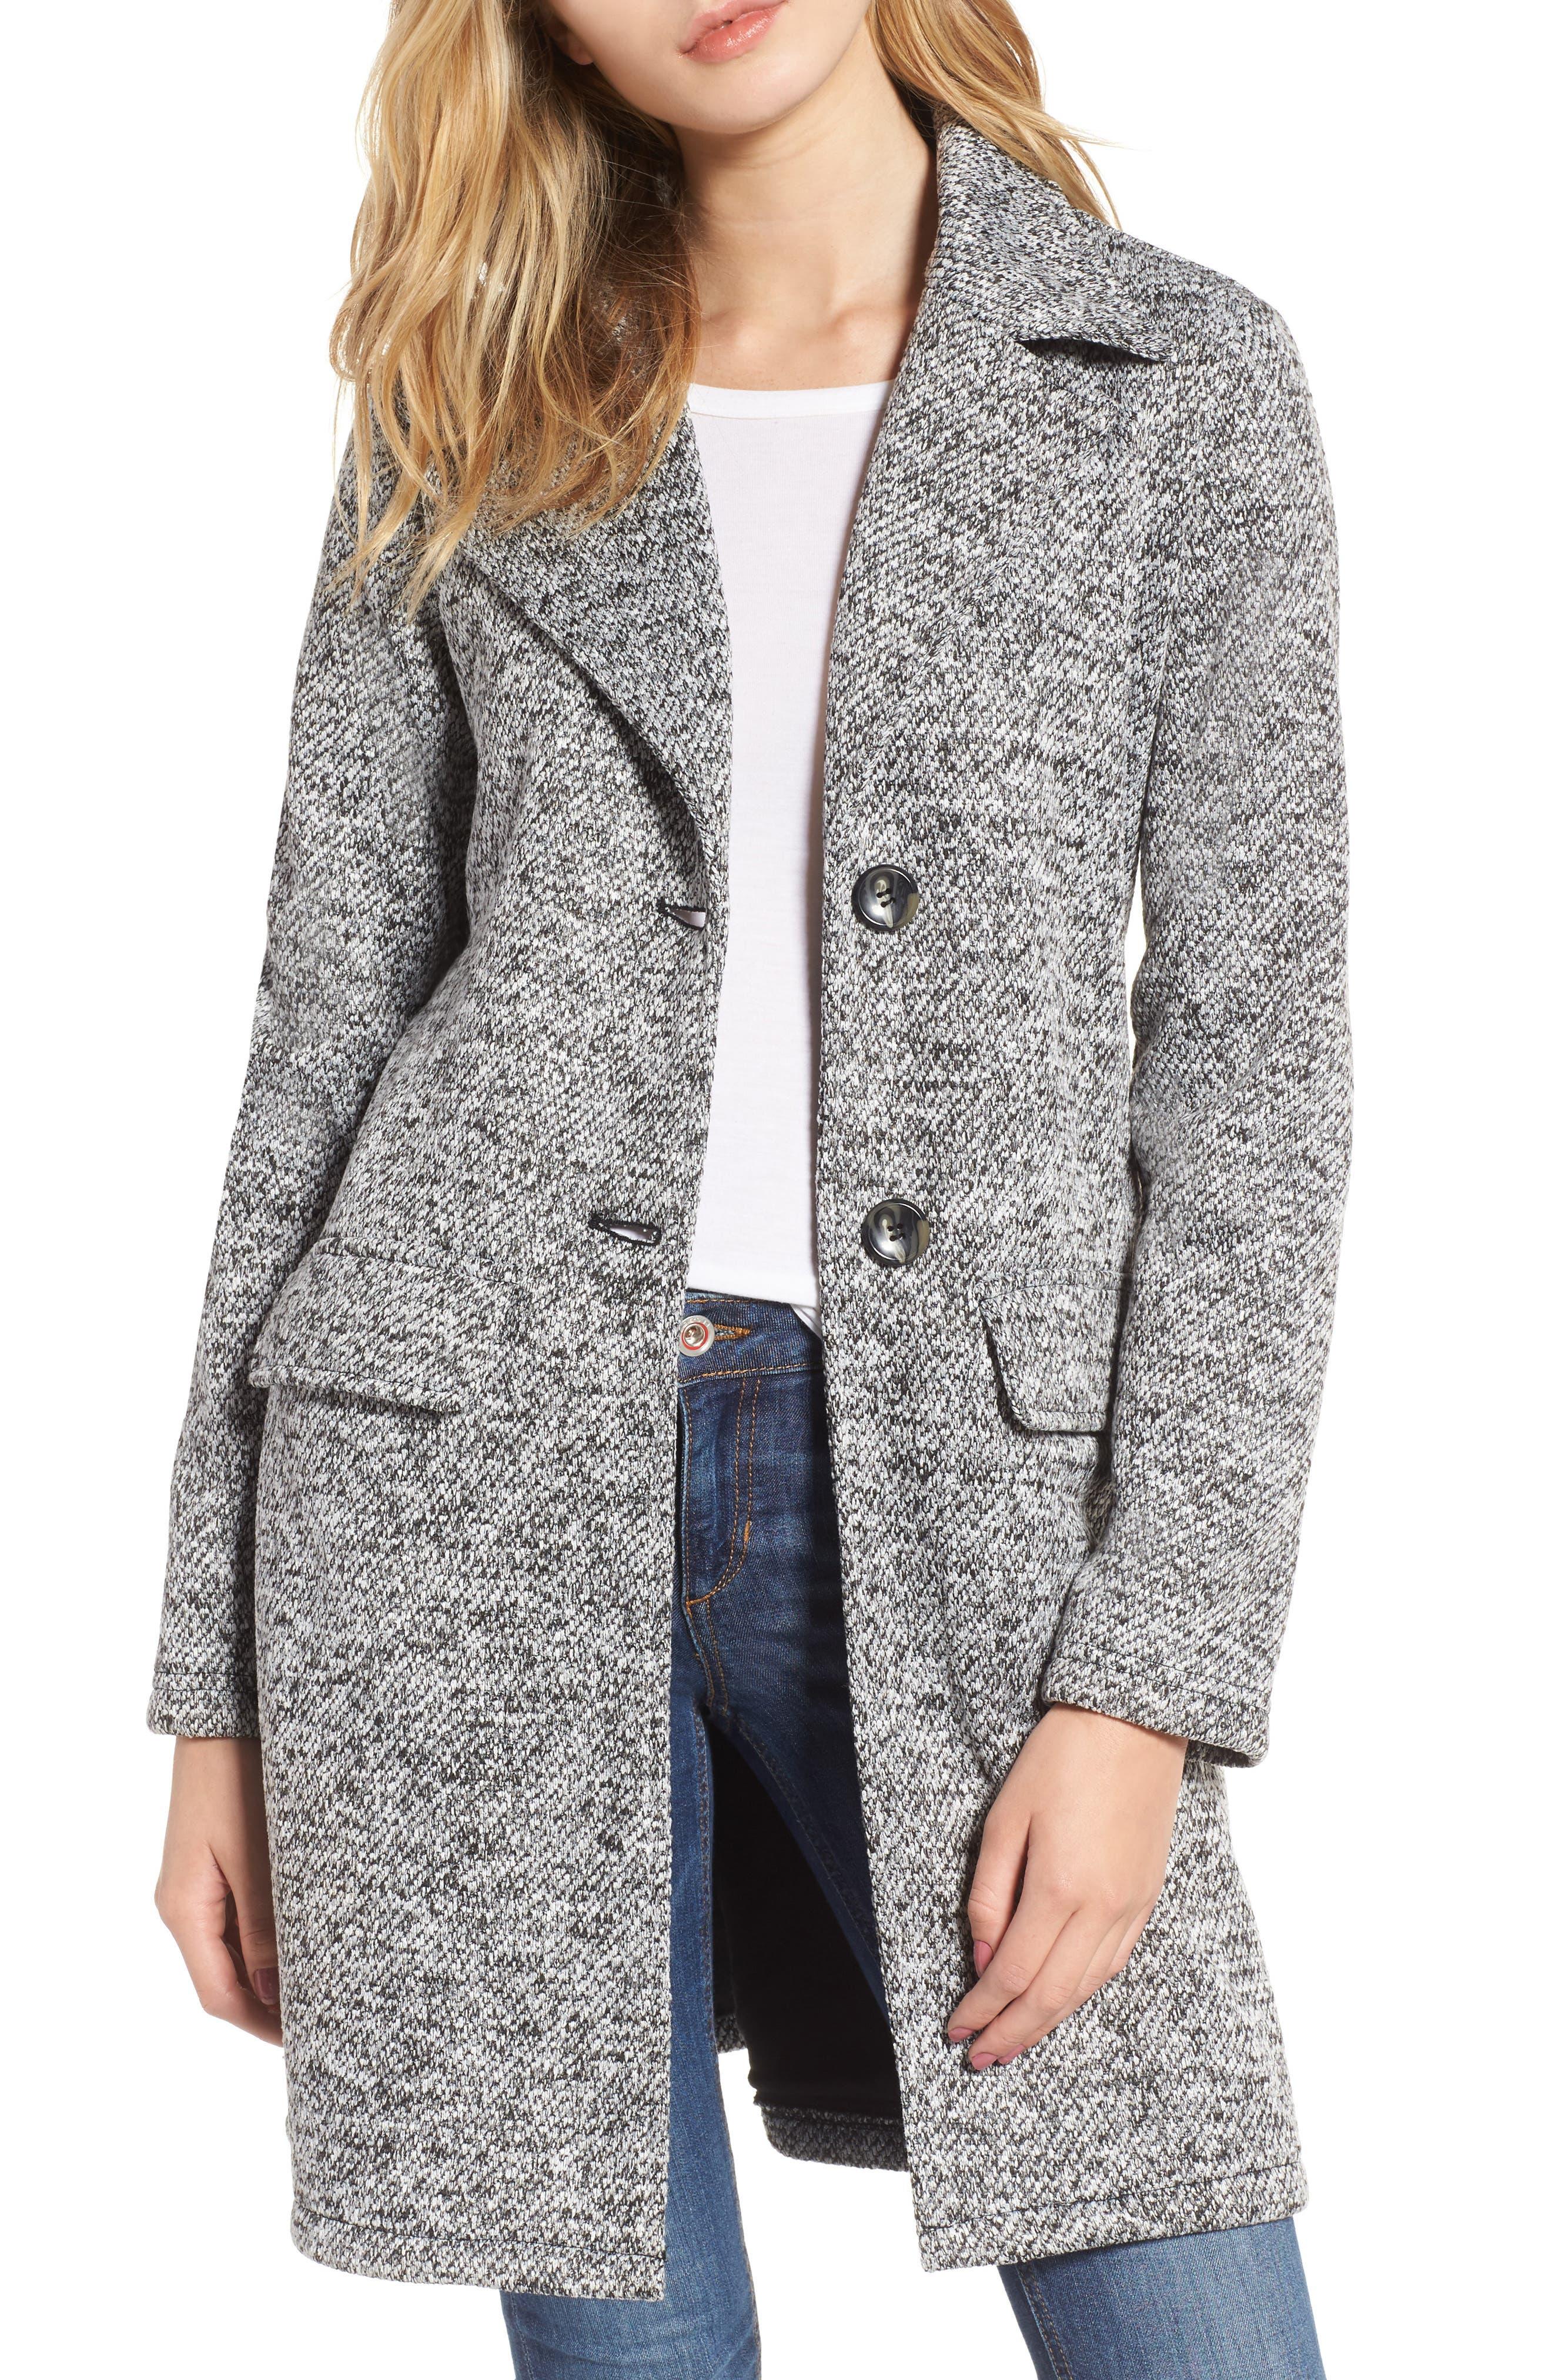 Belted Fleece Jacket,                             Main thumbnail 1, color,                             Light Grey Heather